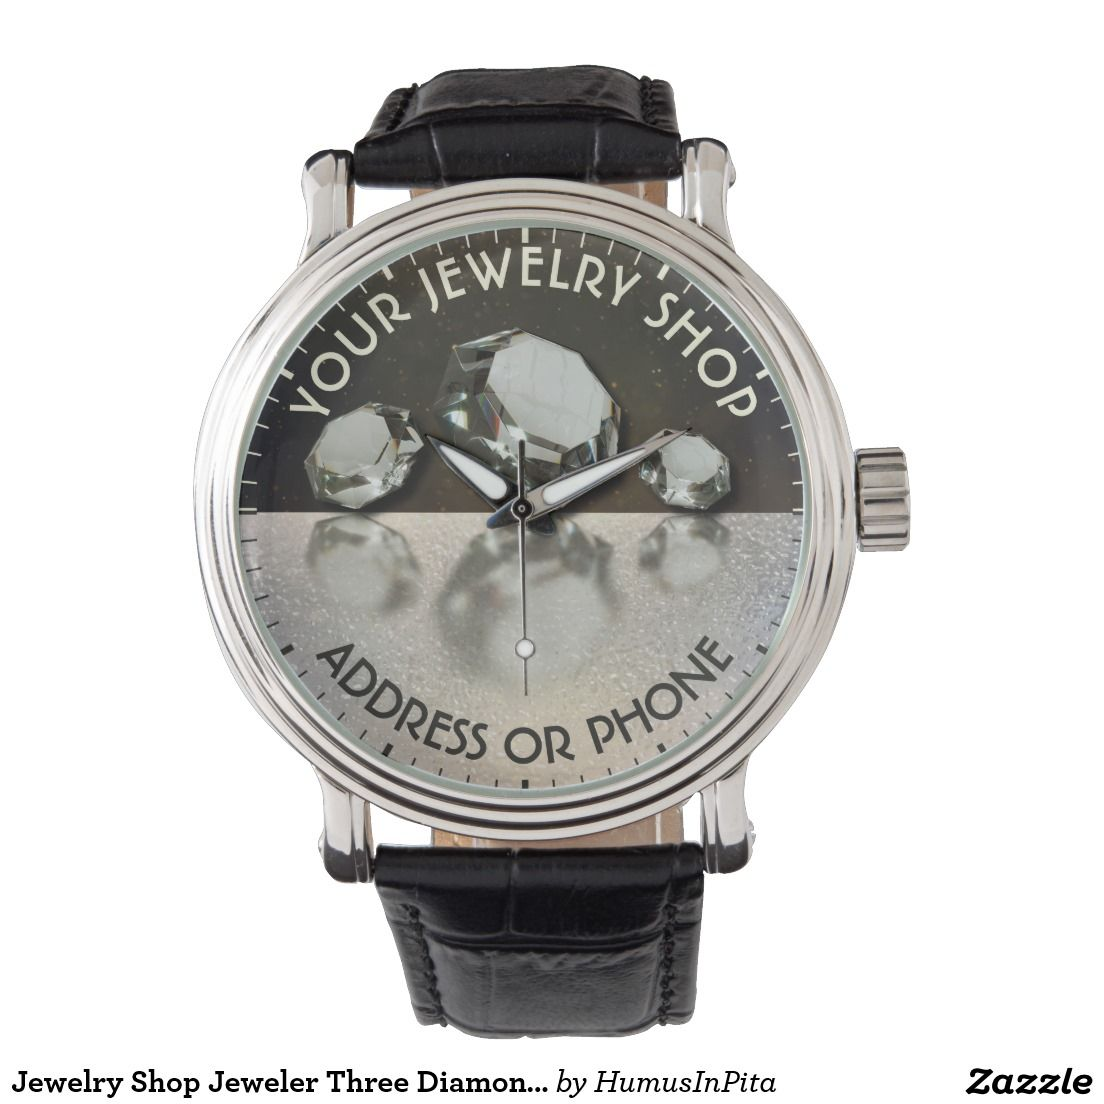 Jewelry Shop Jeweler Three Diamonds On Gold Dust Wrist Watches